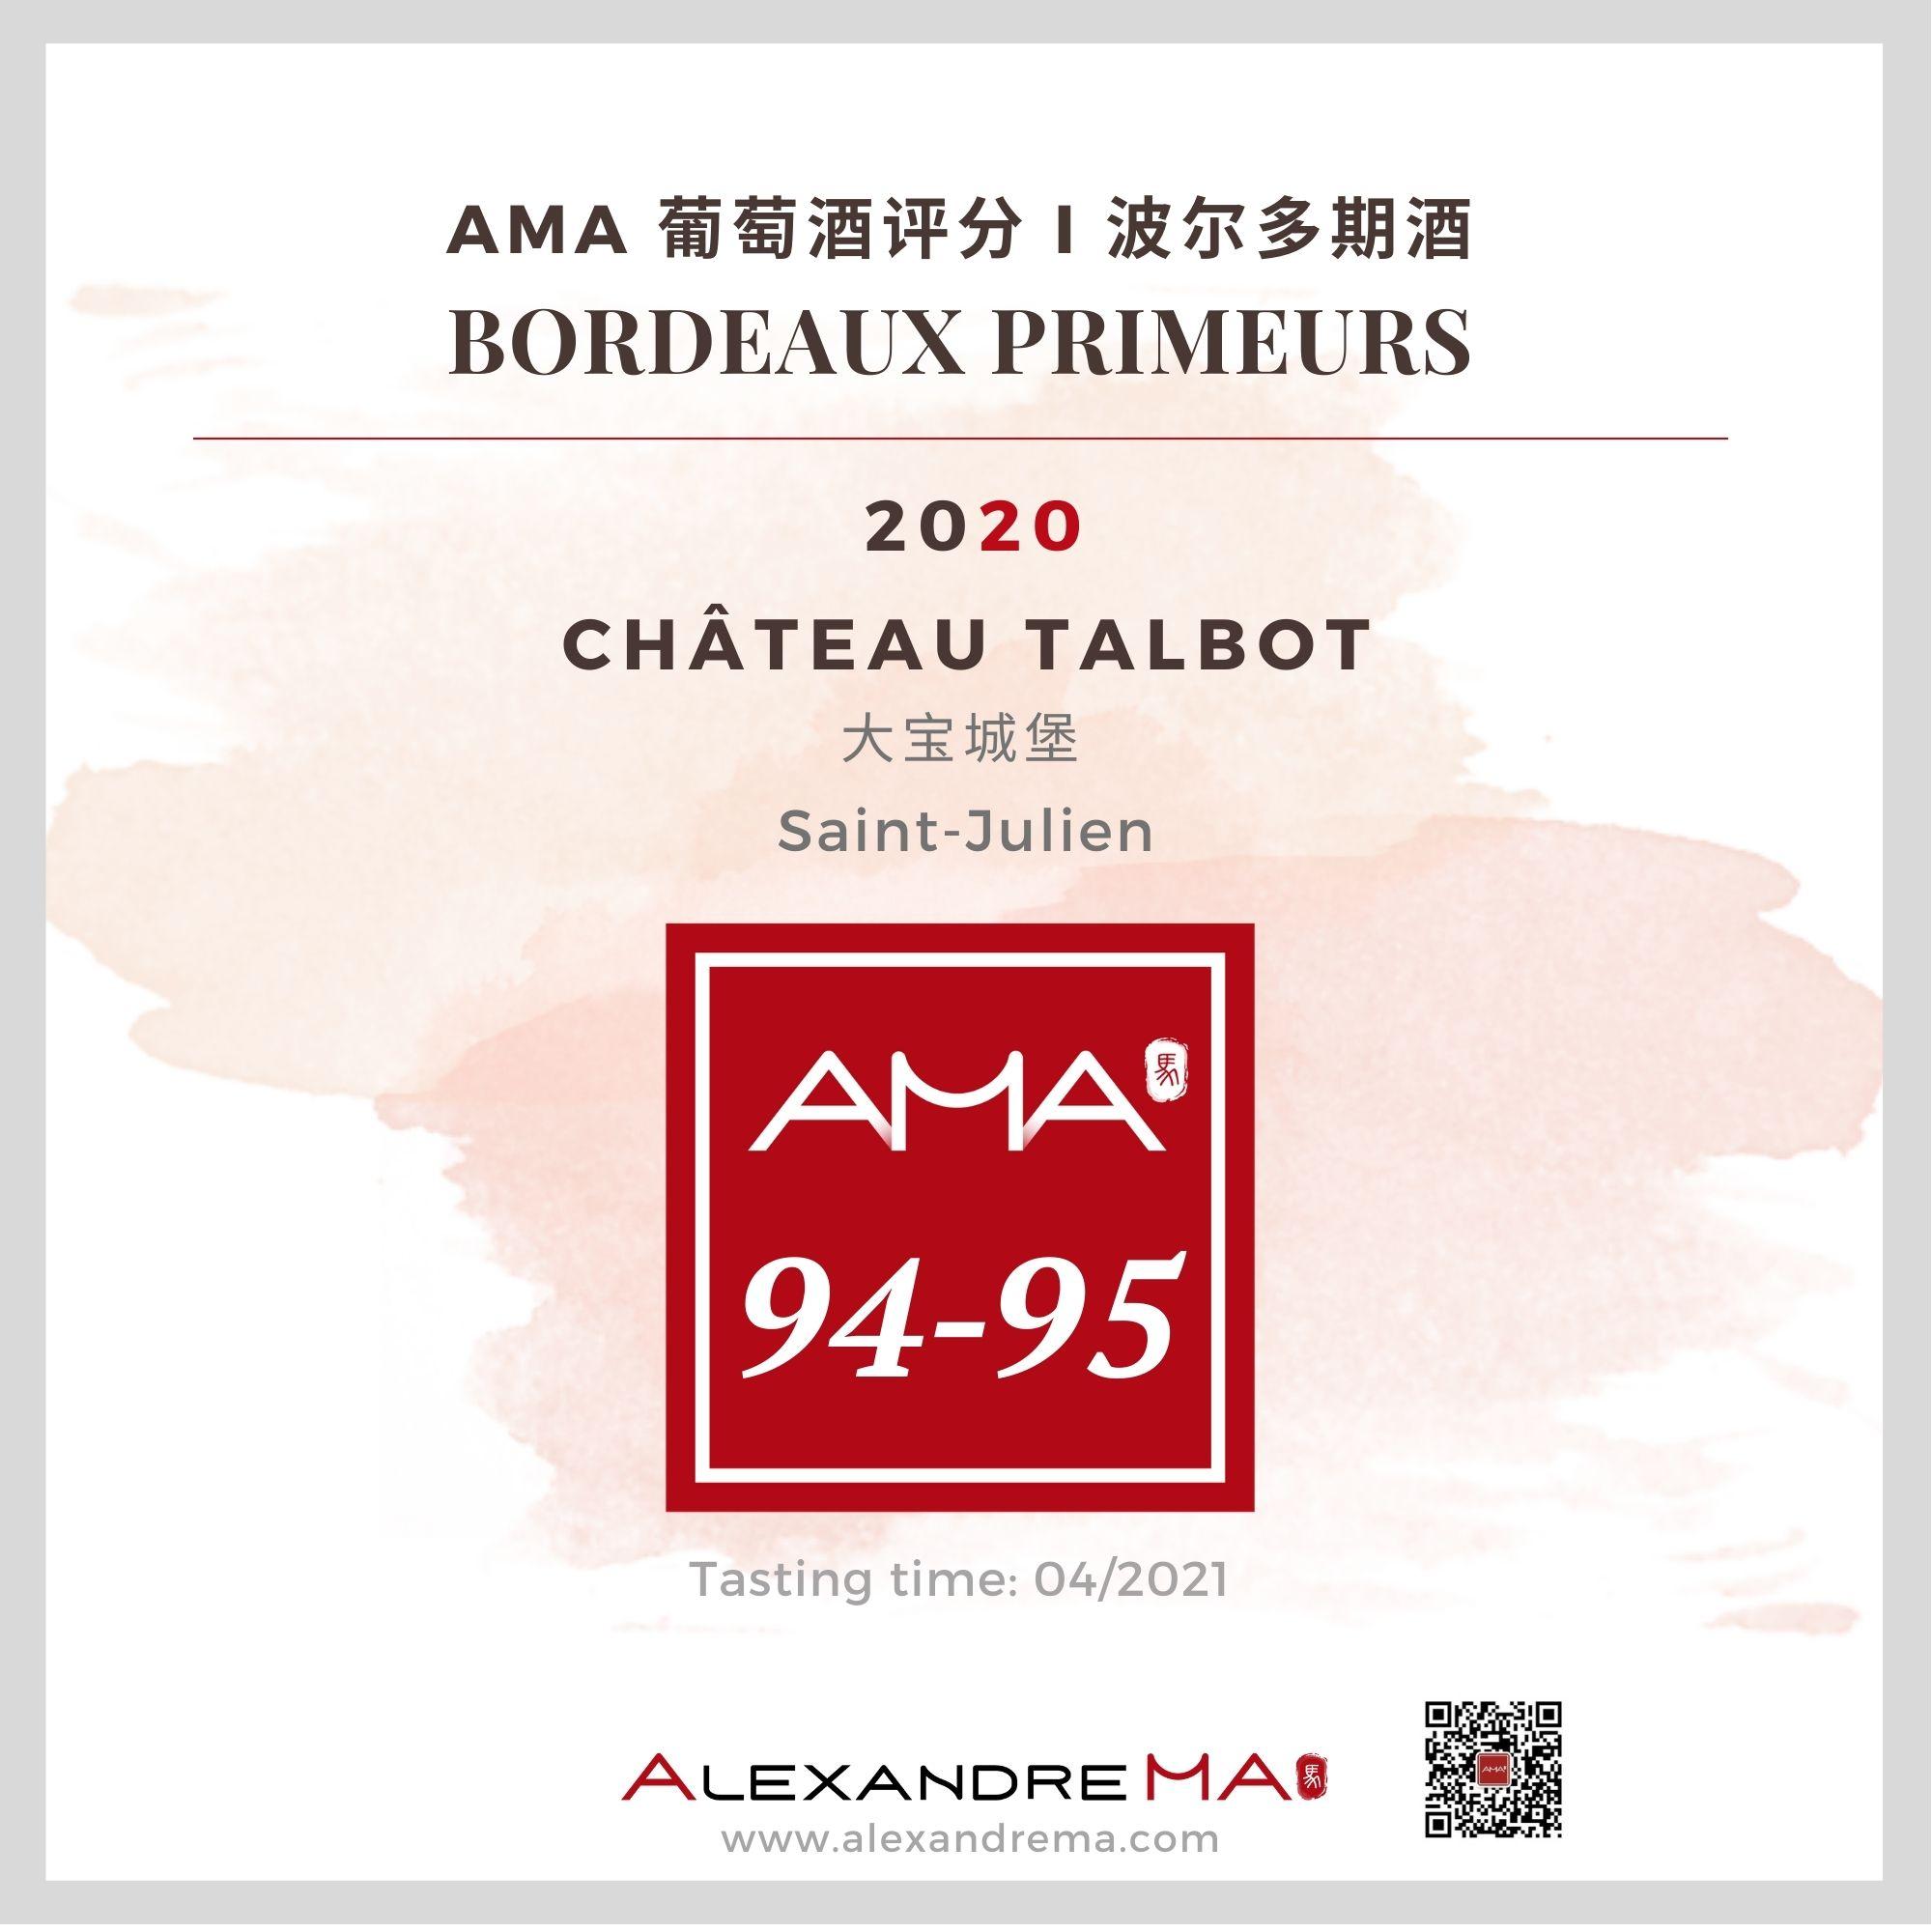 Château Talbot 2020 - Alexandre MA